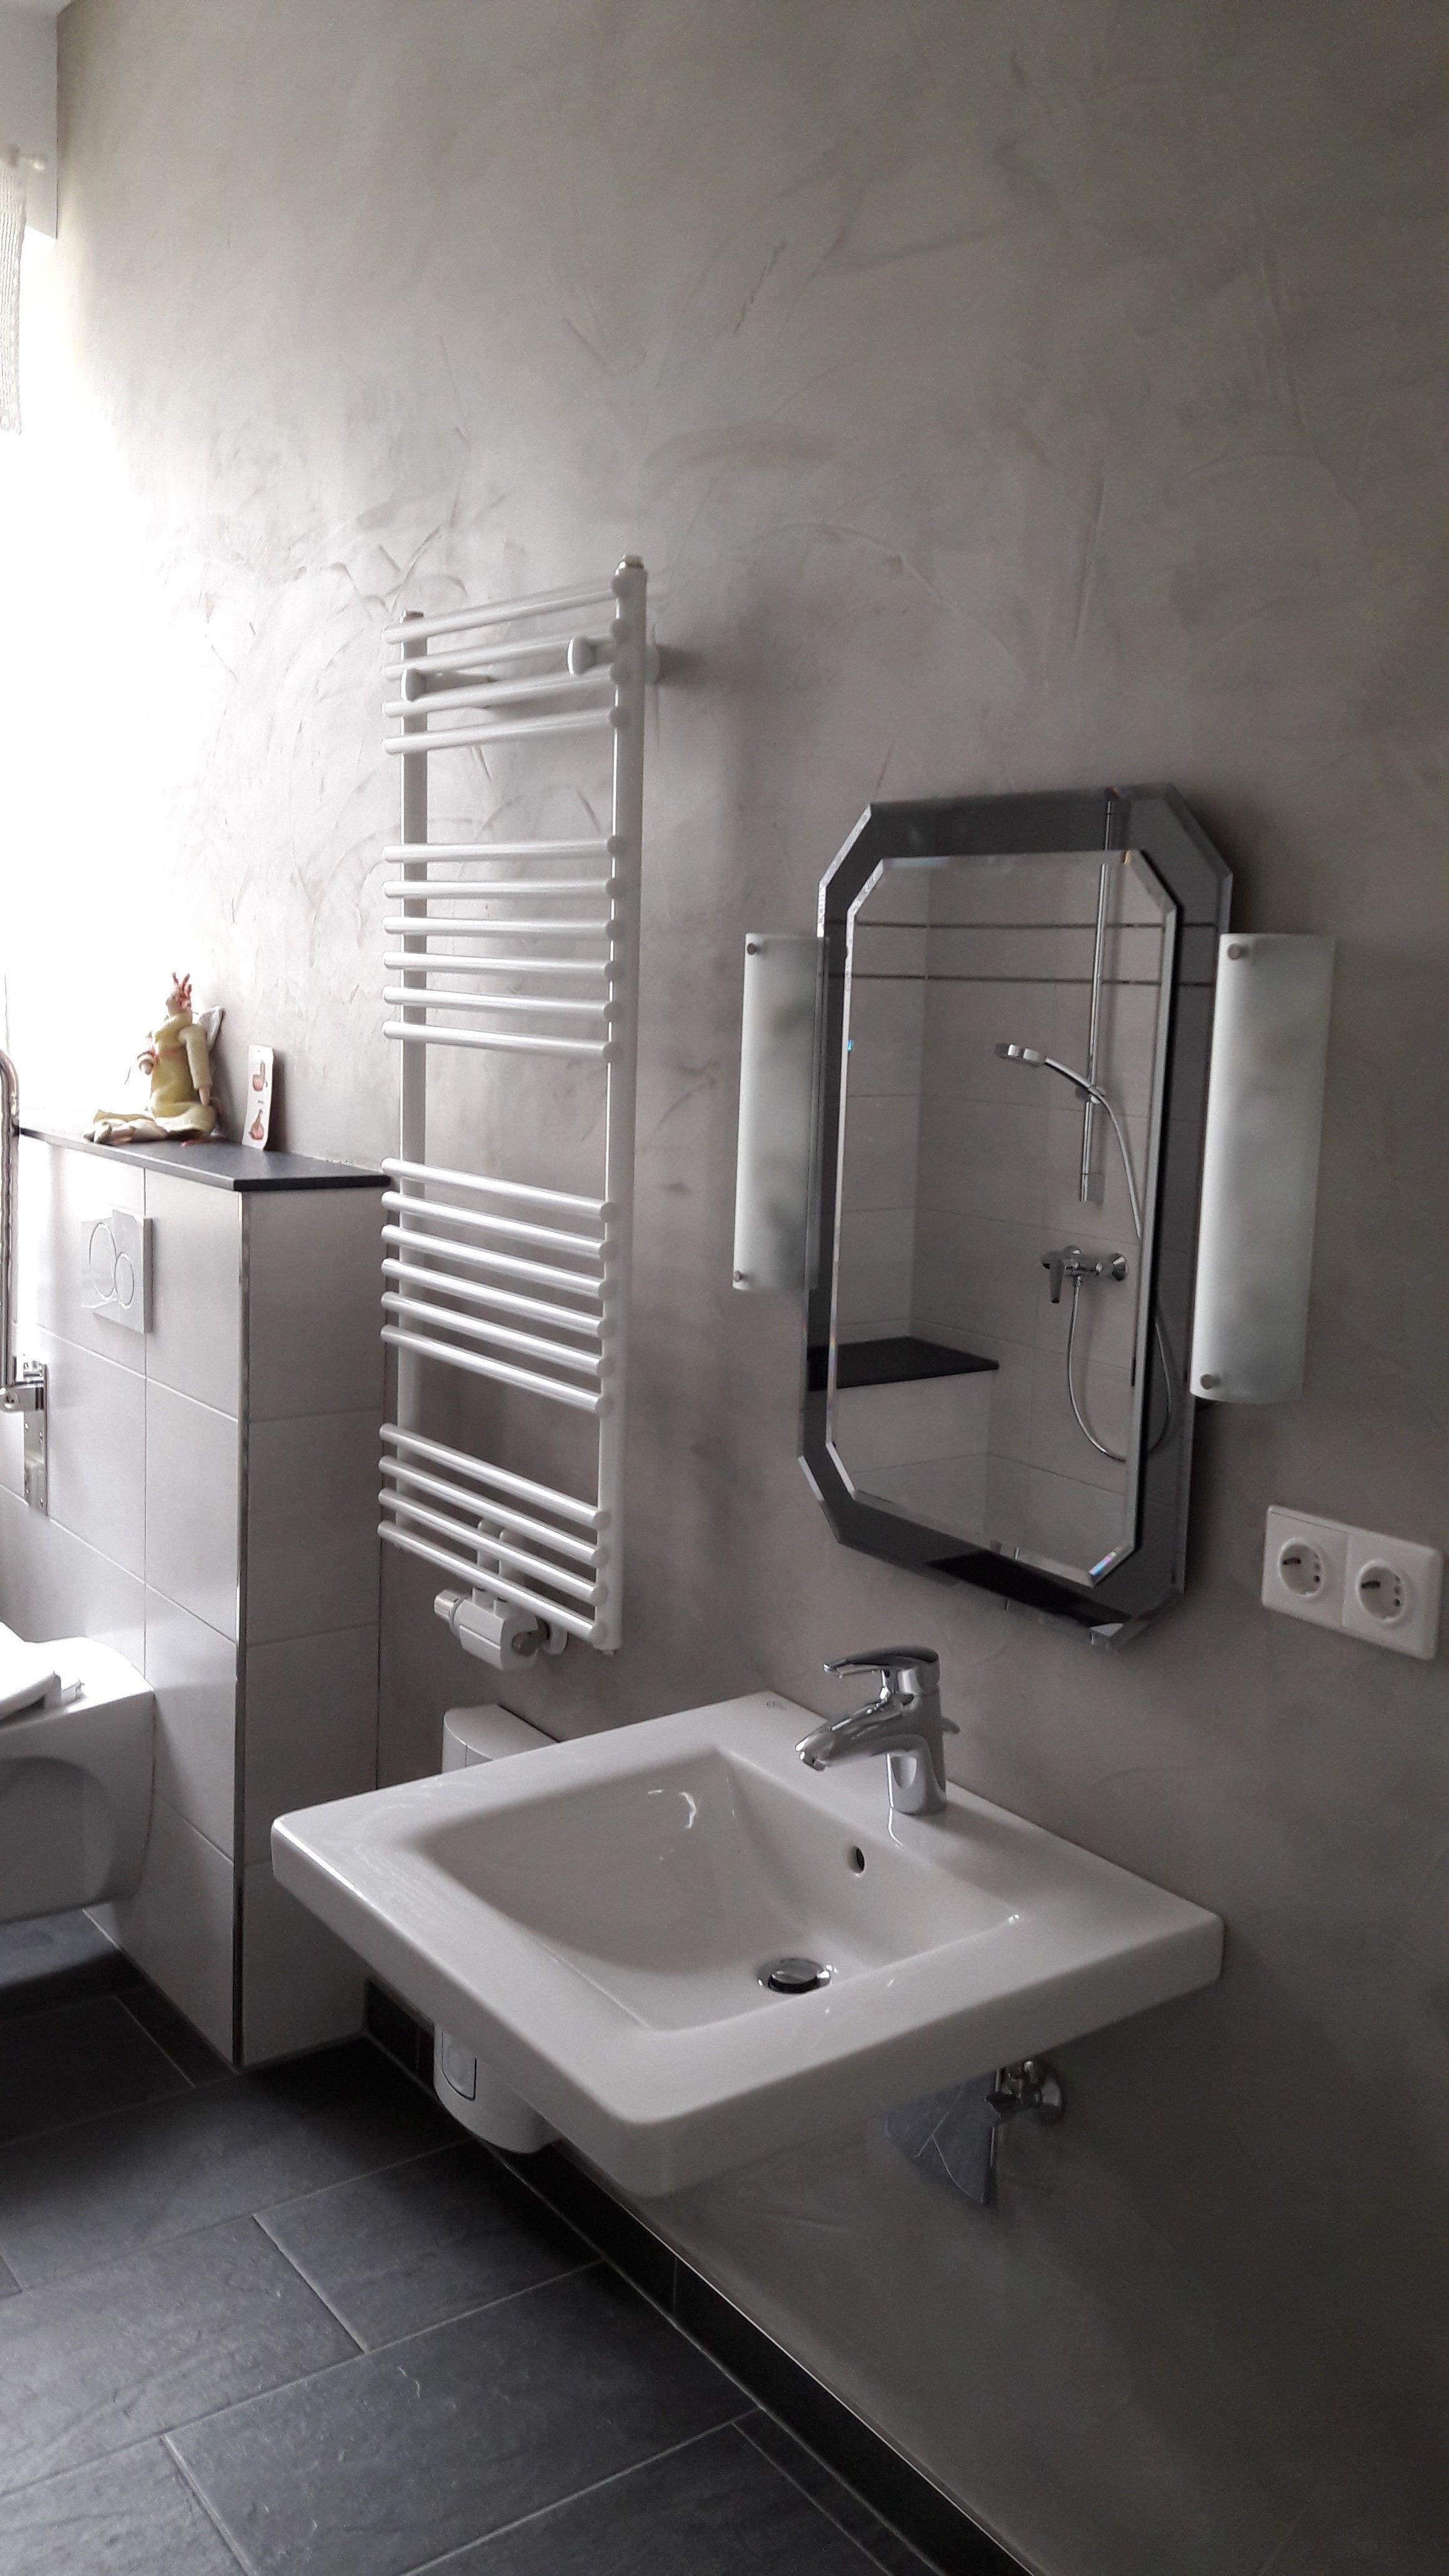 Badezimmer Pandomo Dekorative Innenwandtechnik Spachteltechnik Bodengestaltung Badezimmer Wande